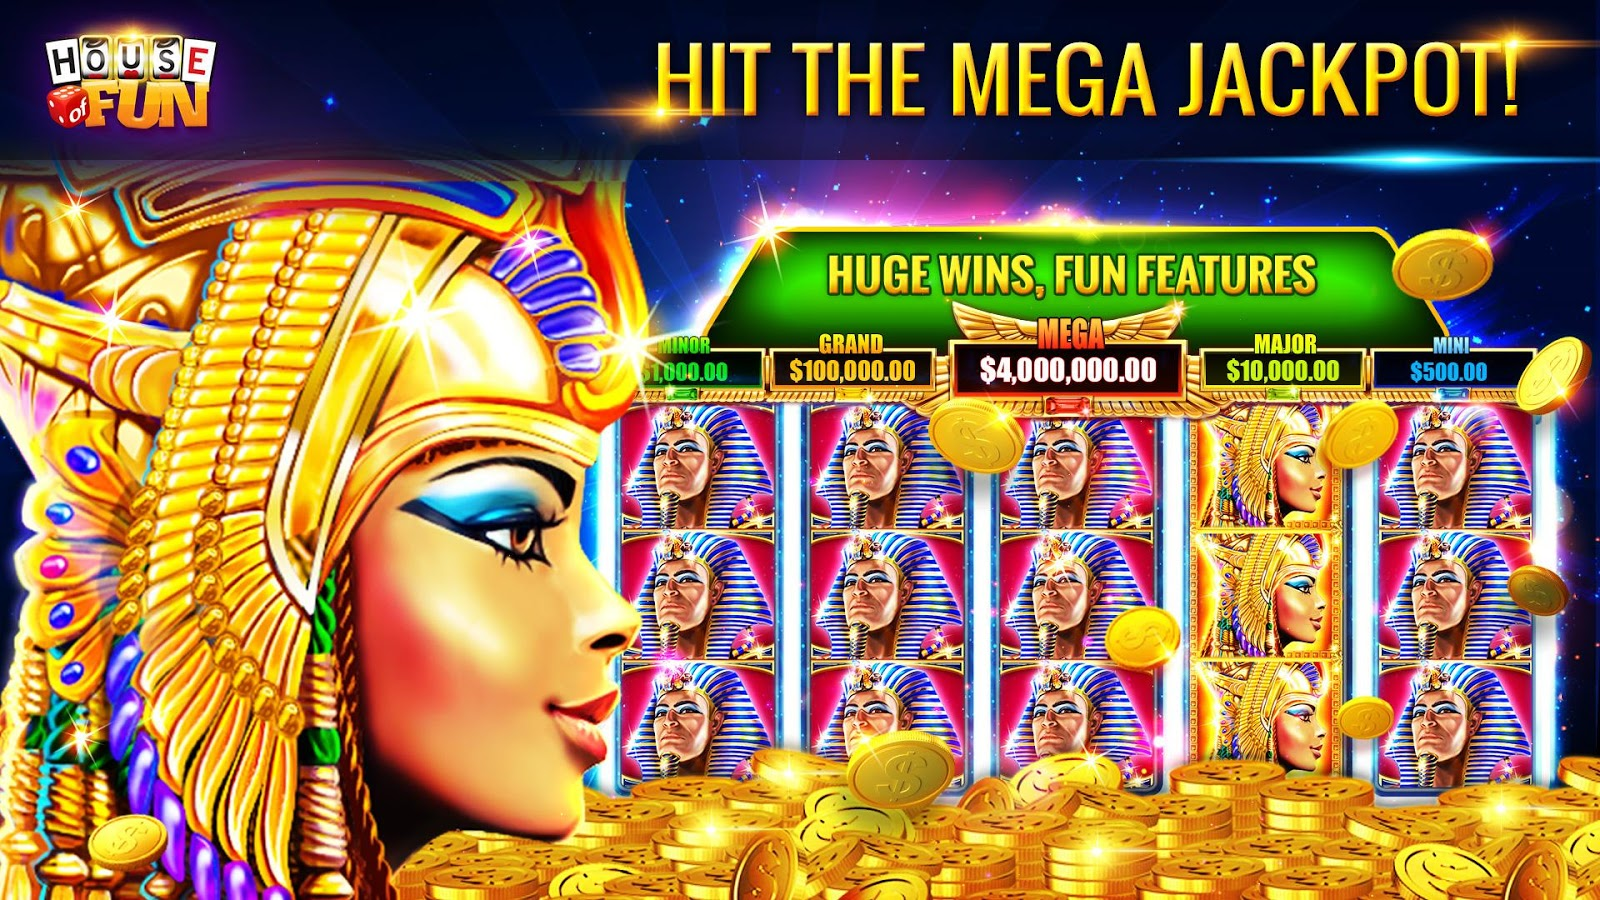 150+free slots-free casino slot machine games